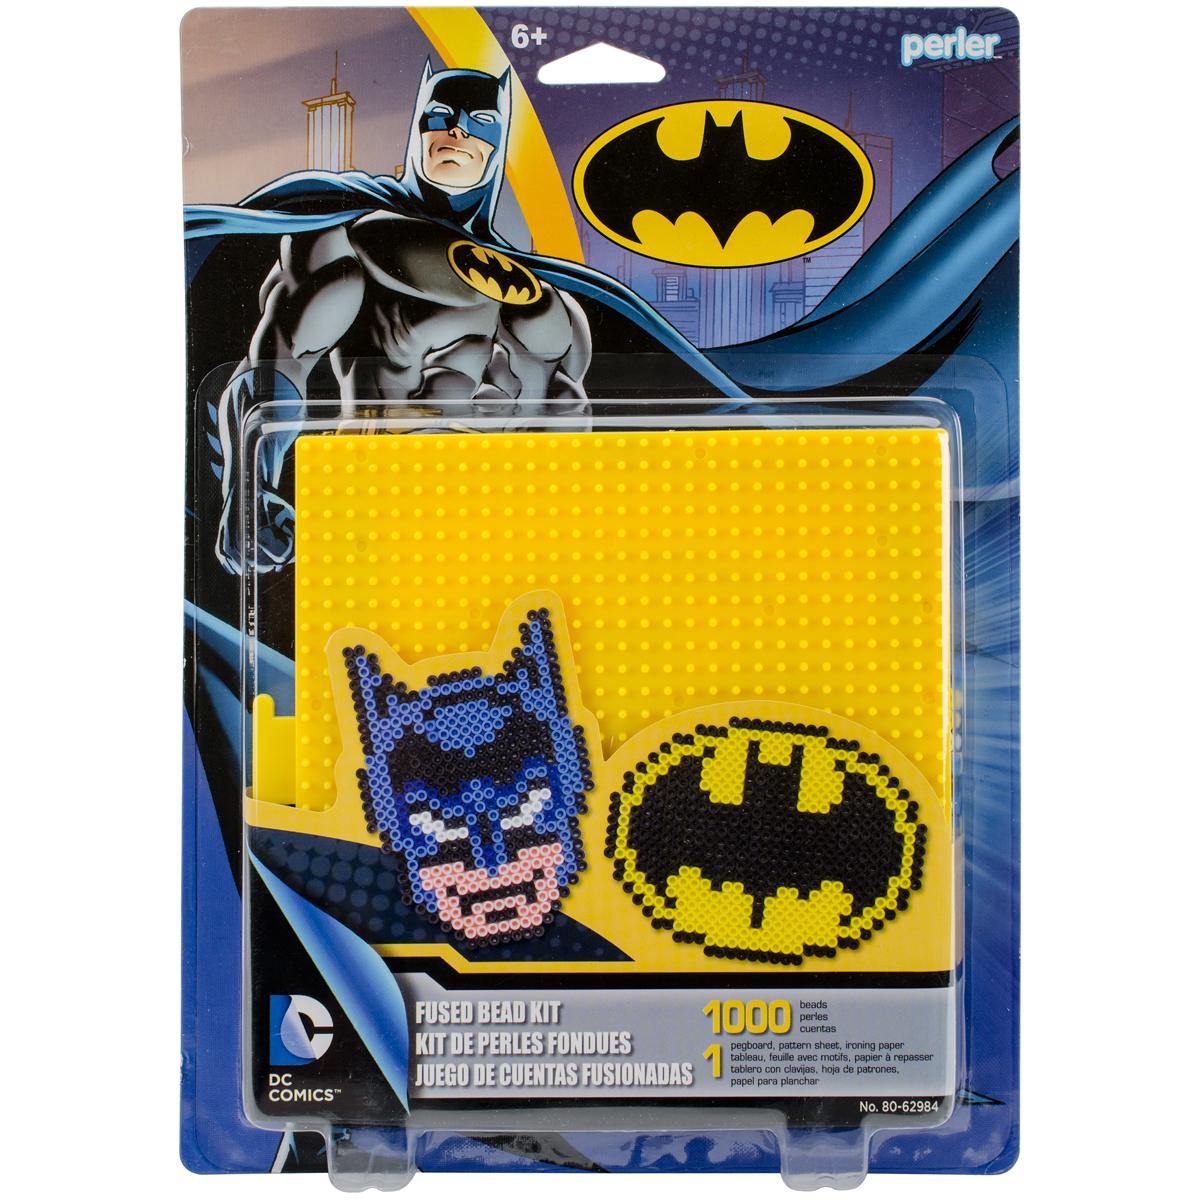 Perler Fused Bead Kit-Batman